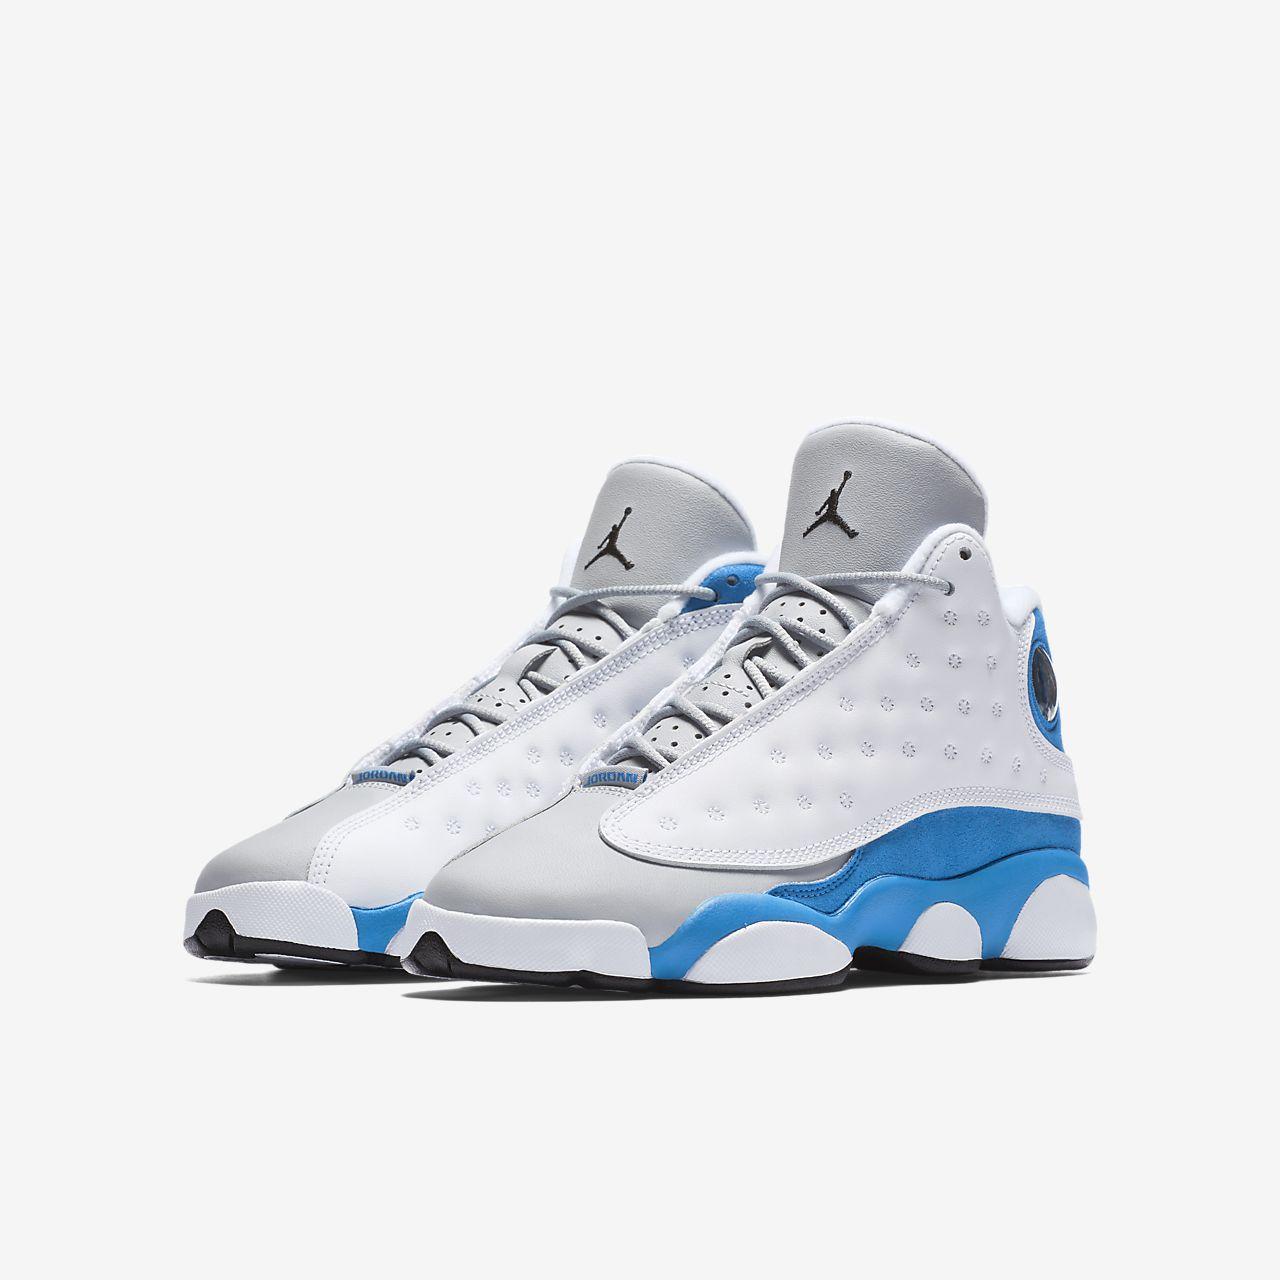 c8b02c4fd3e53 Air Jordan 13 Retro Older Kids  Shoe. Nike.com VN